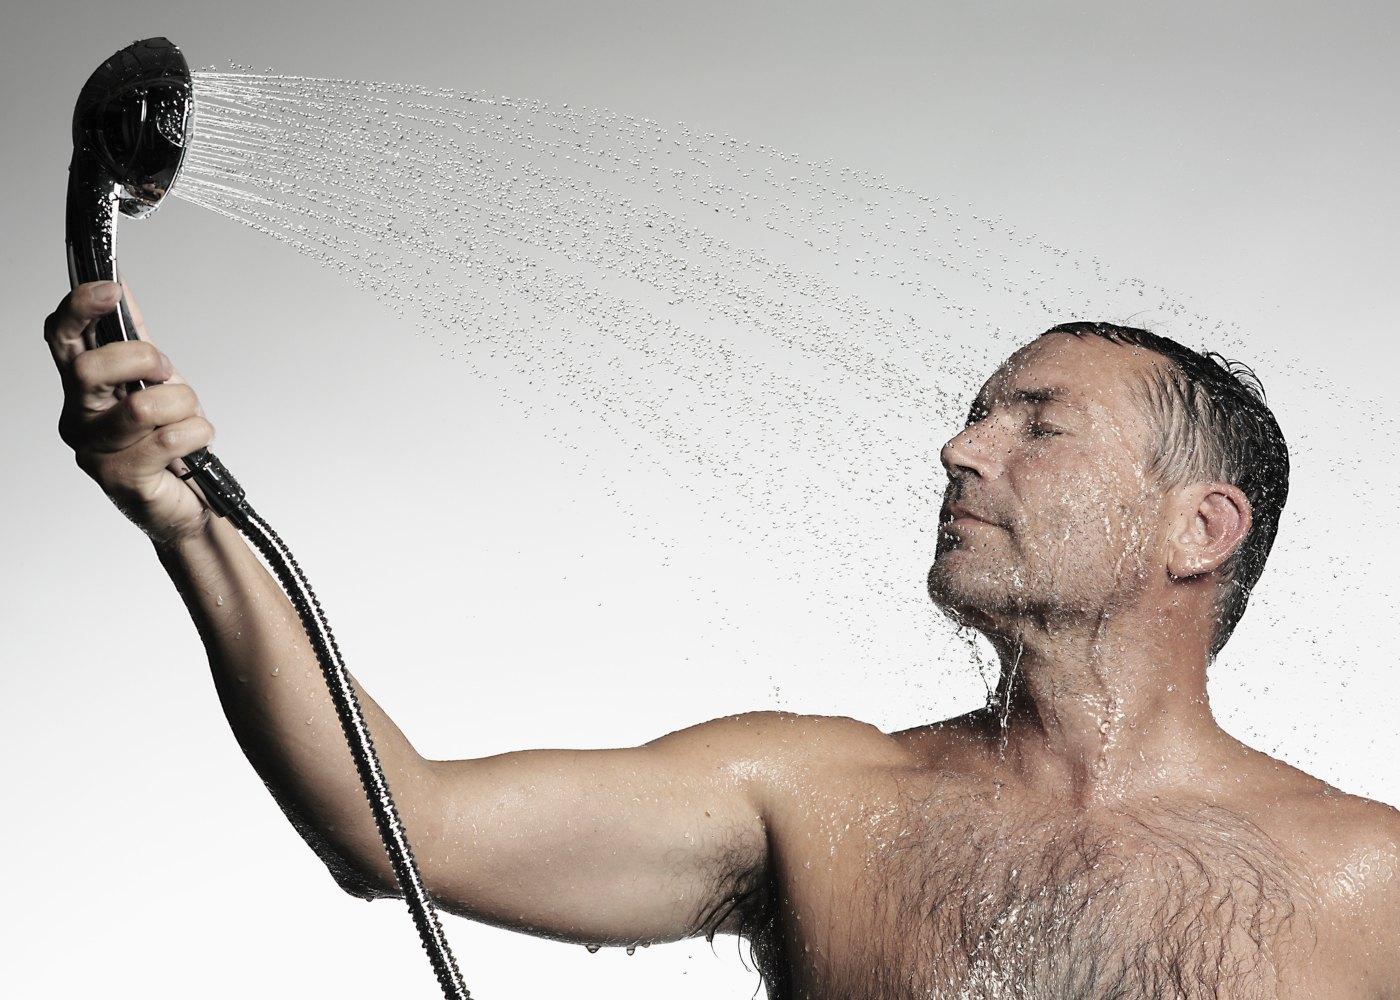 Homem a tomar um duche